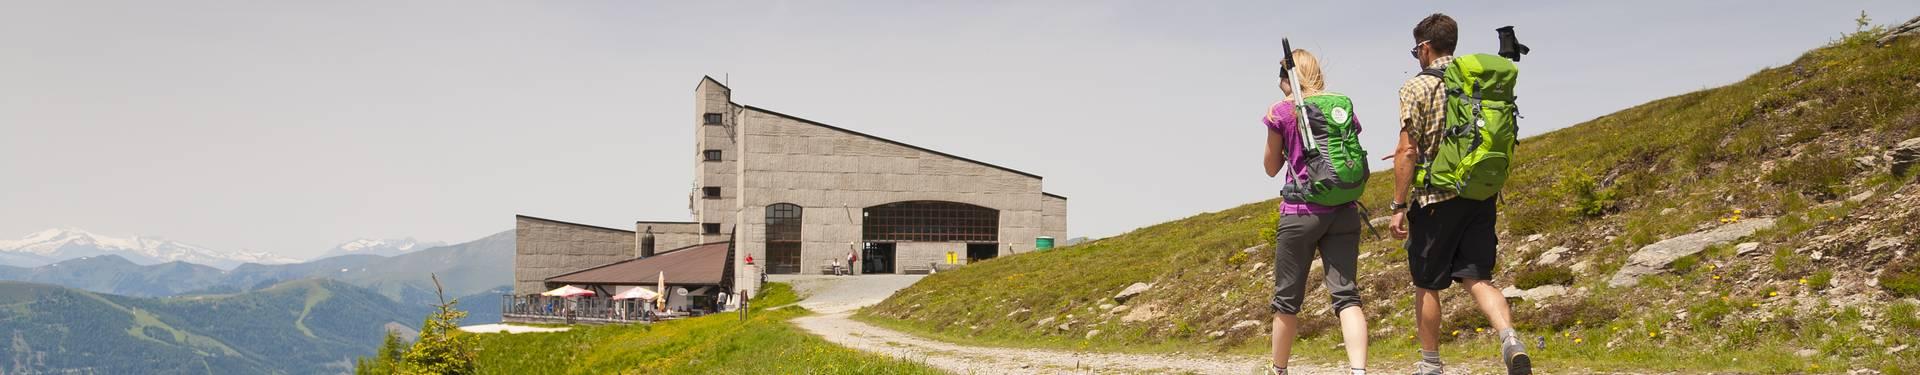 Kaiserburg Bad Kleinkirchheim